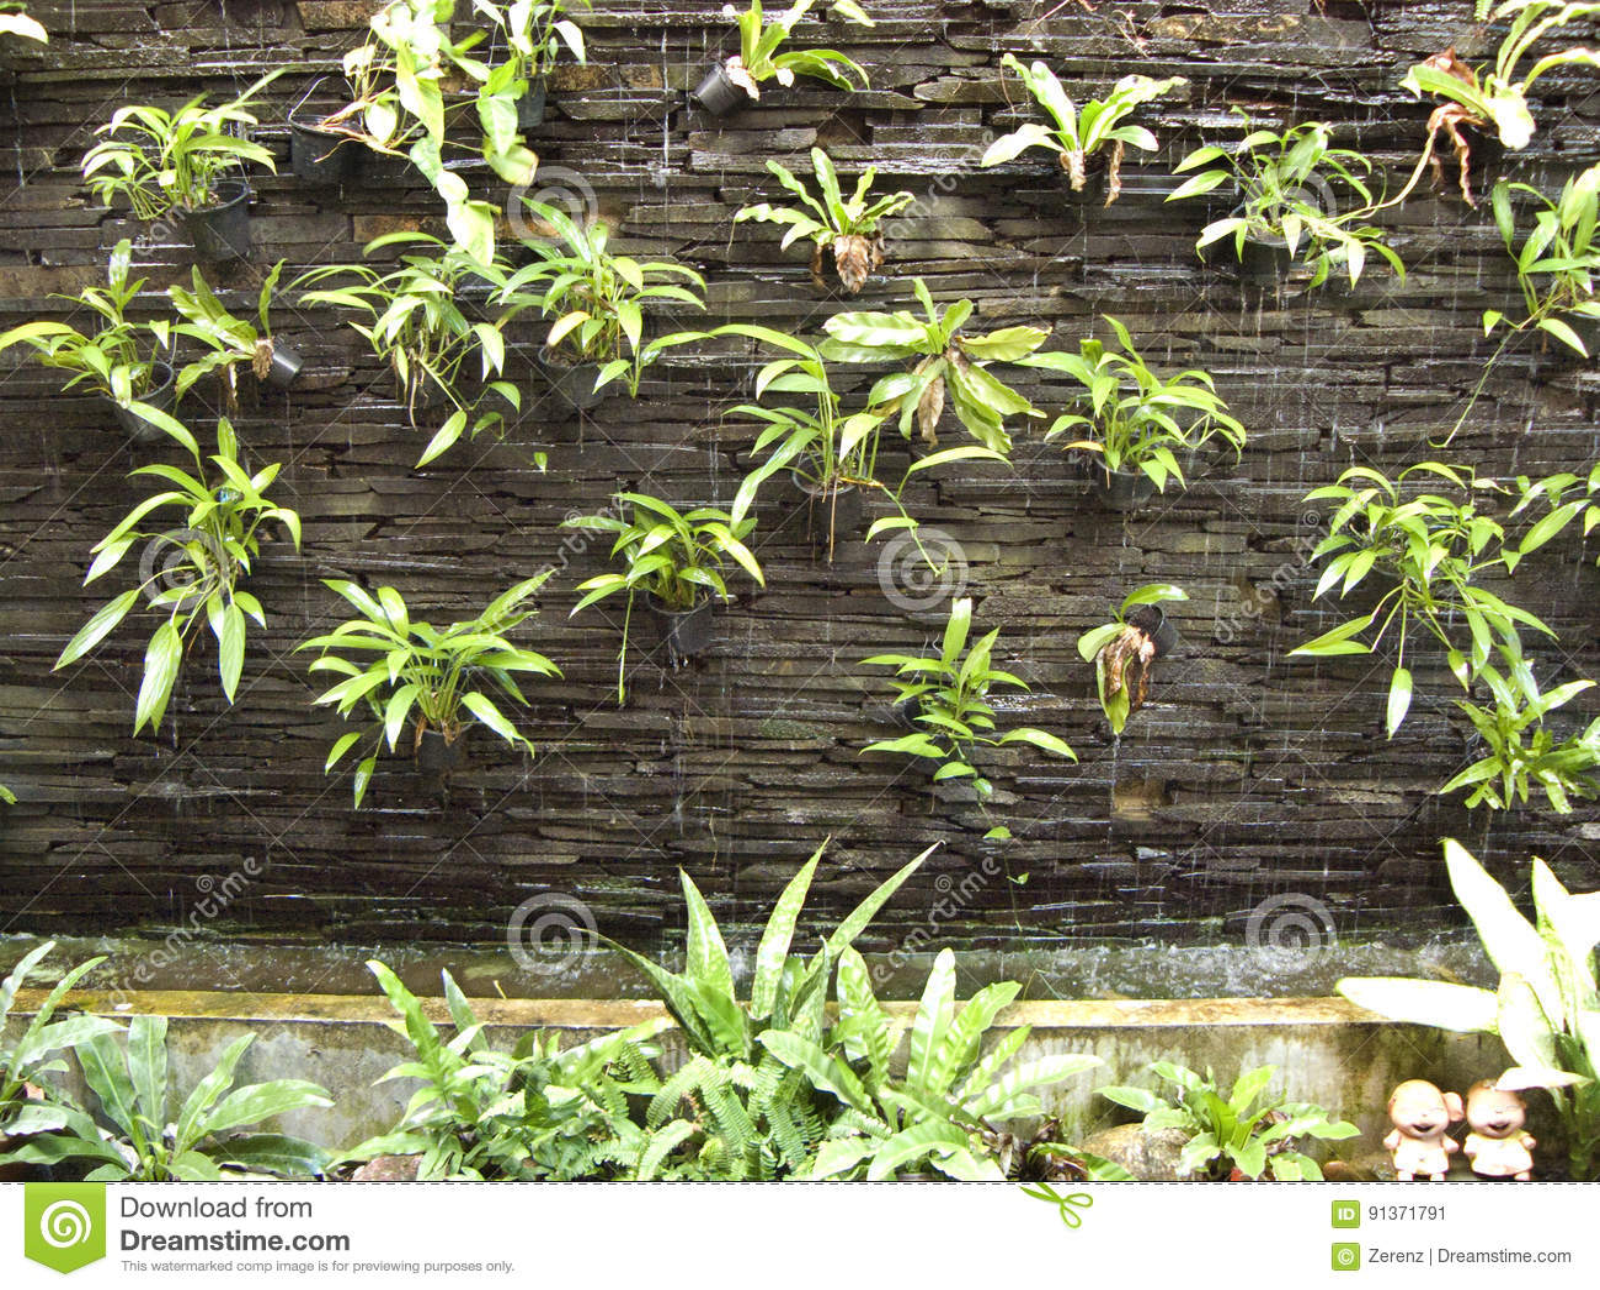 Bakstenen Muur Tuin : Verticale tuin op rotsbakstenen muur stock afbeelding afbeelding